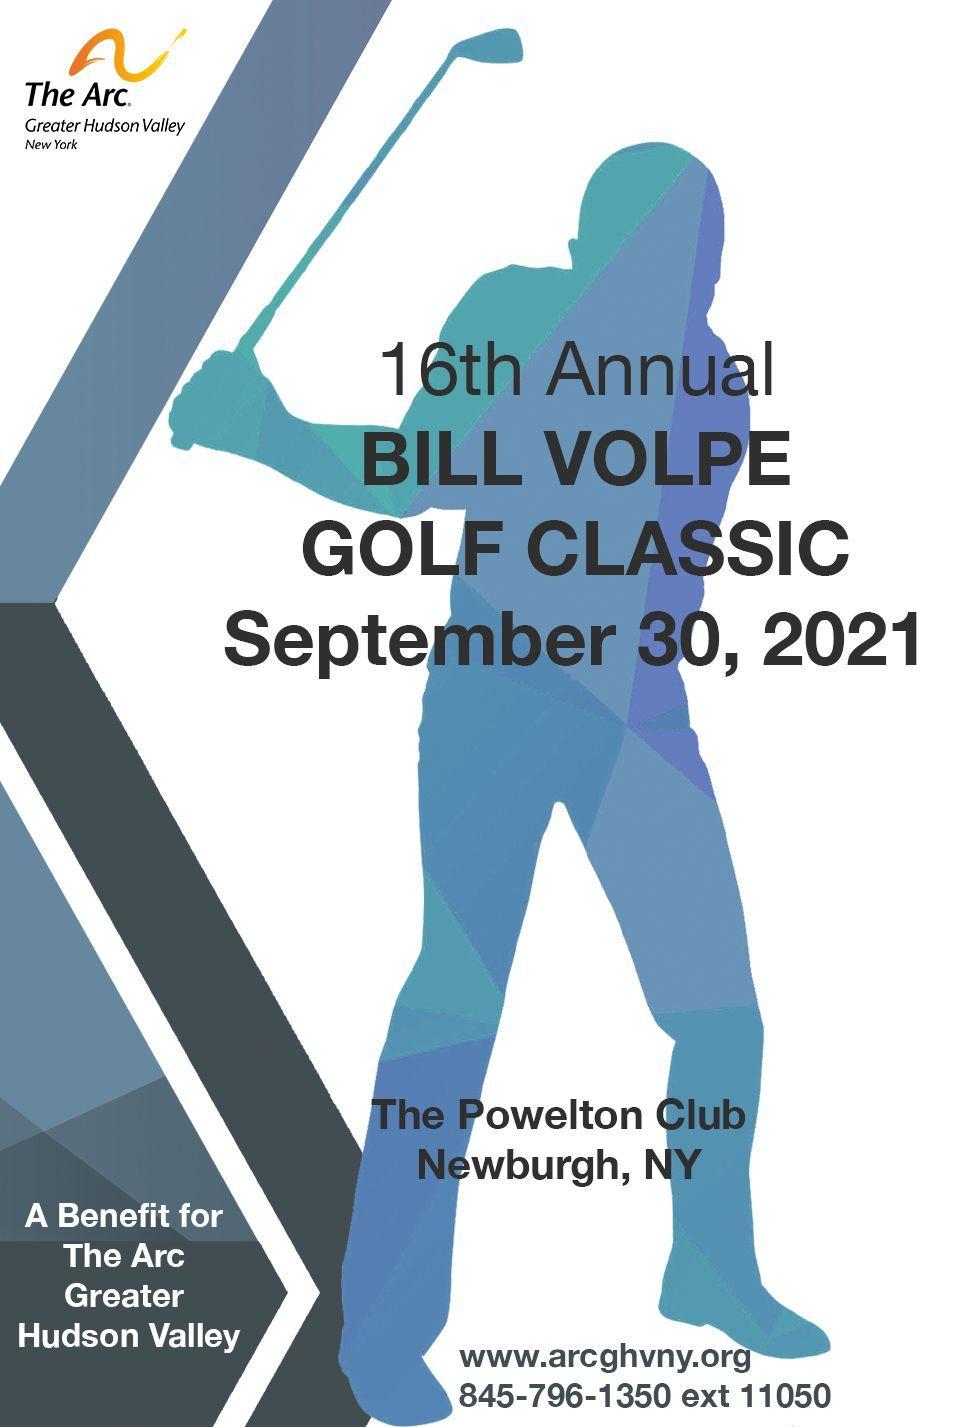 Bill Volpe Golf Classic